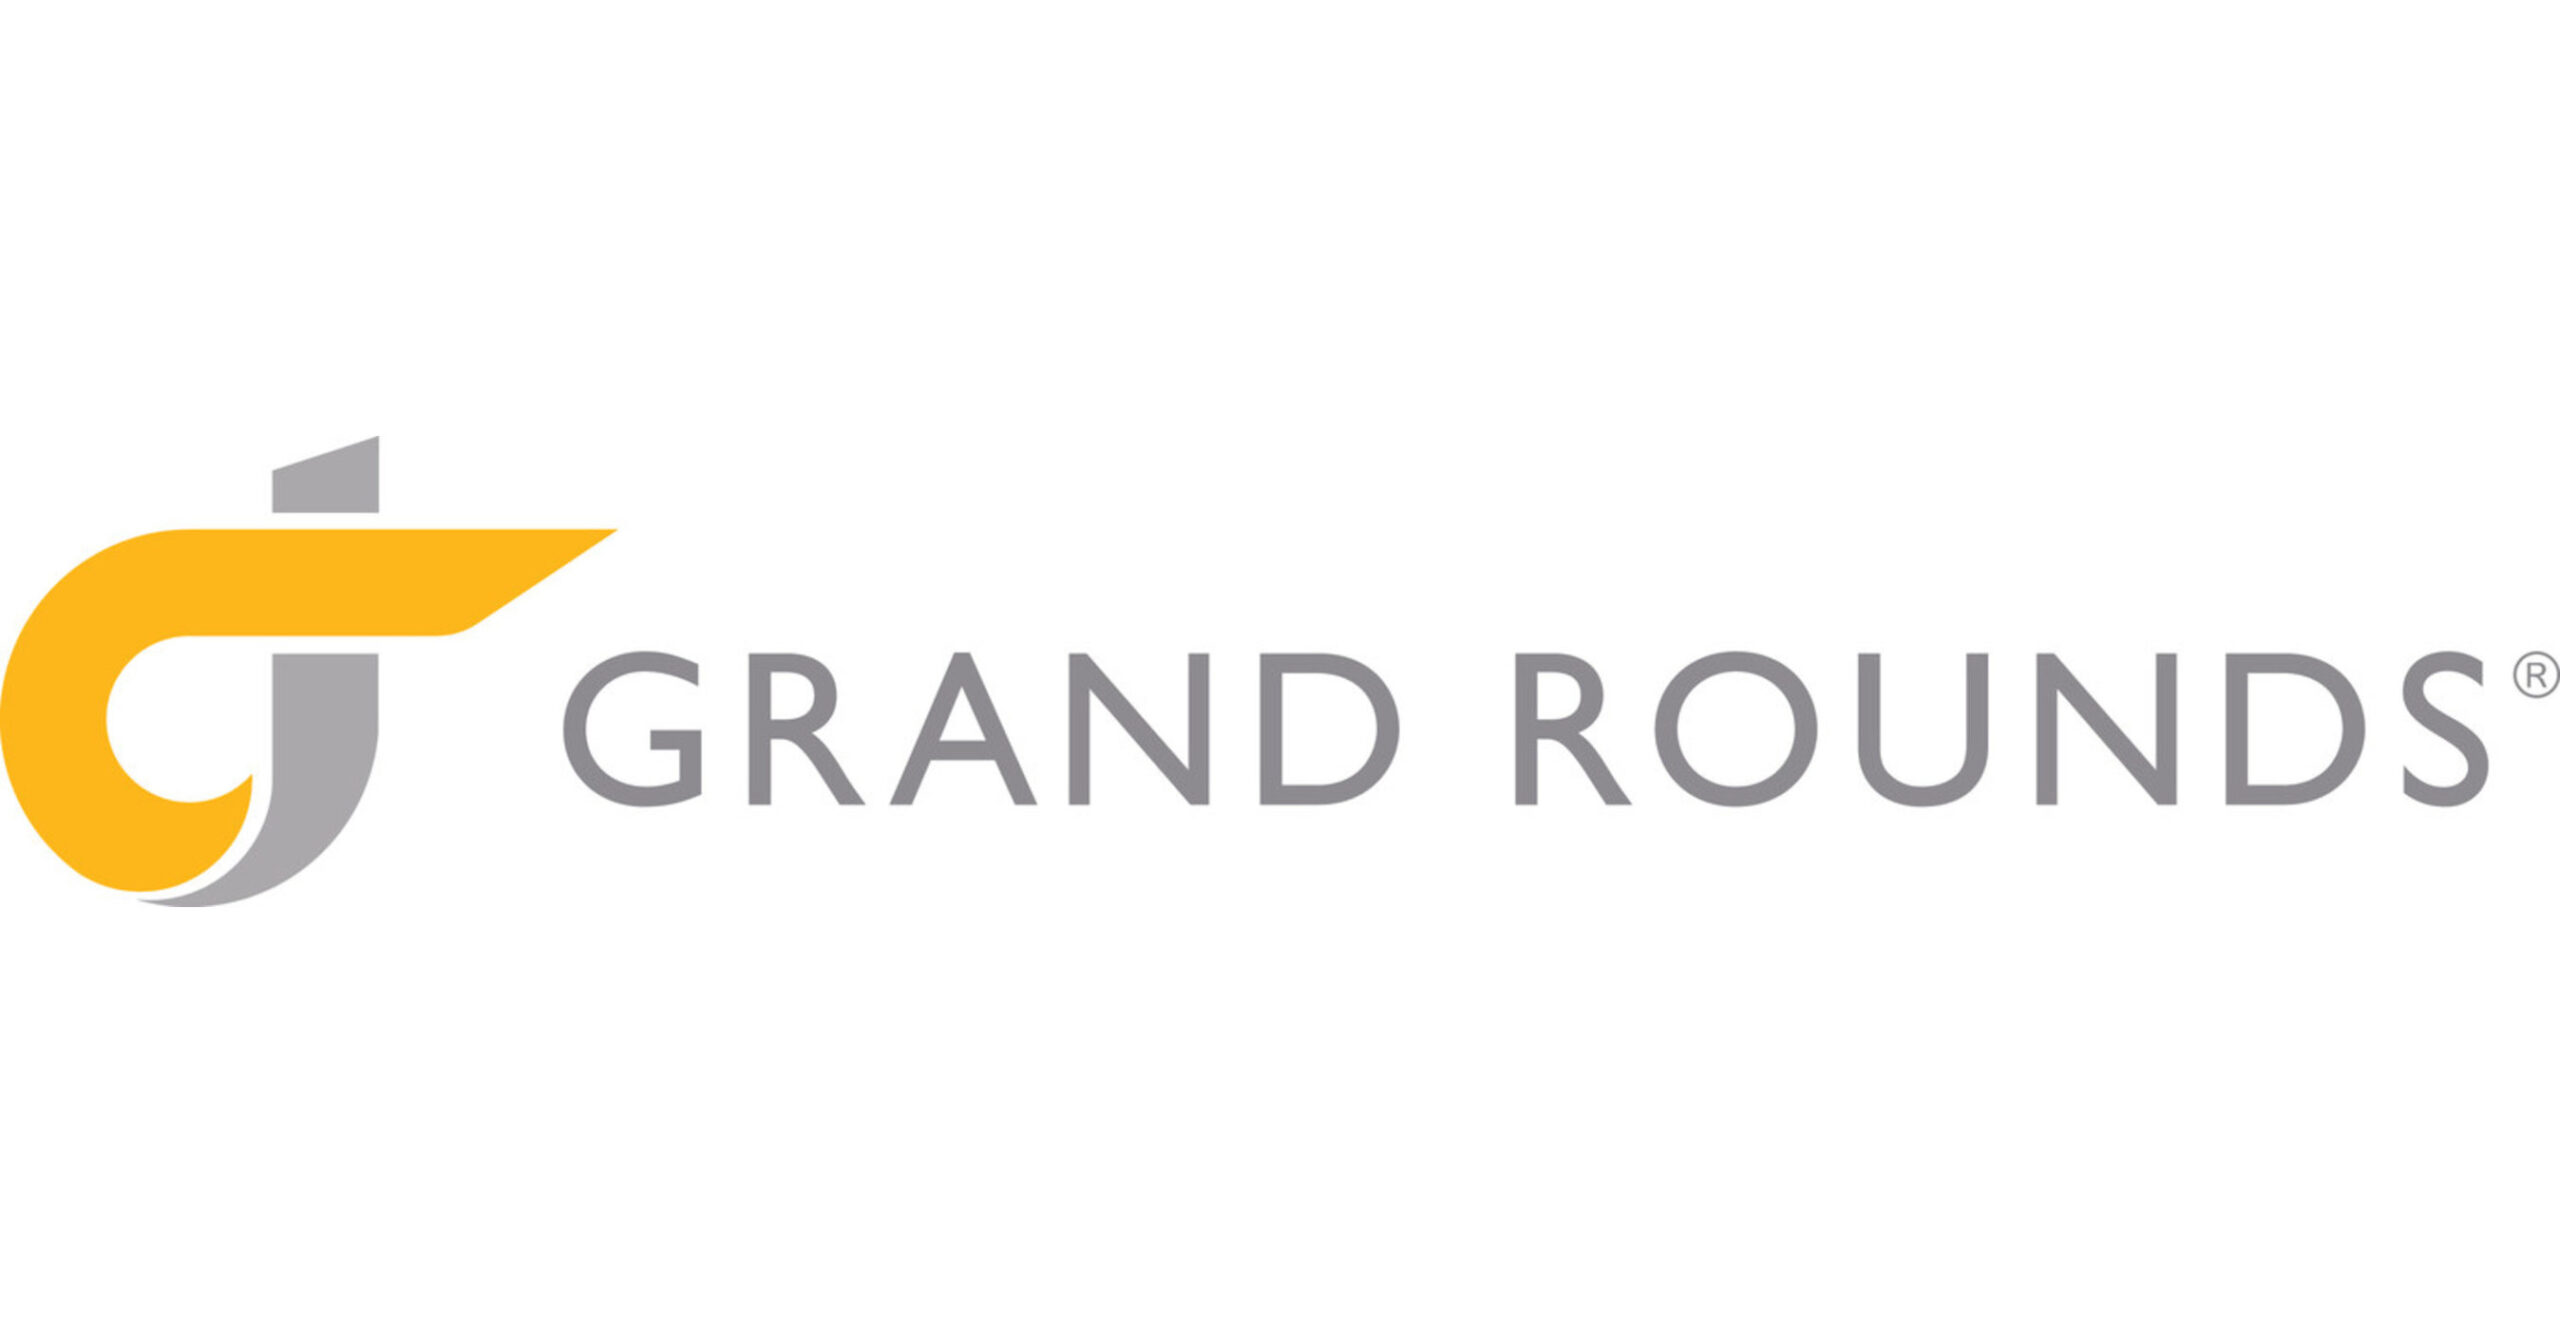 (PRNewsfoto/Grand Rounds, Inc.)